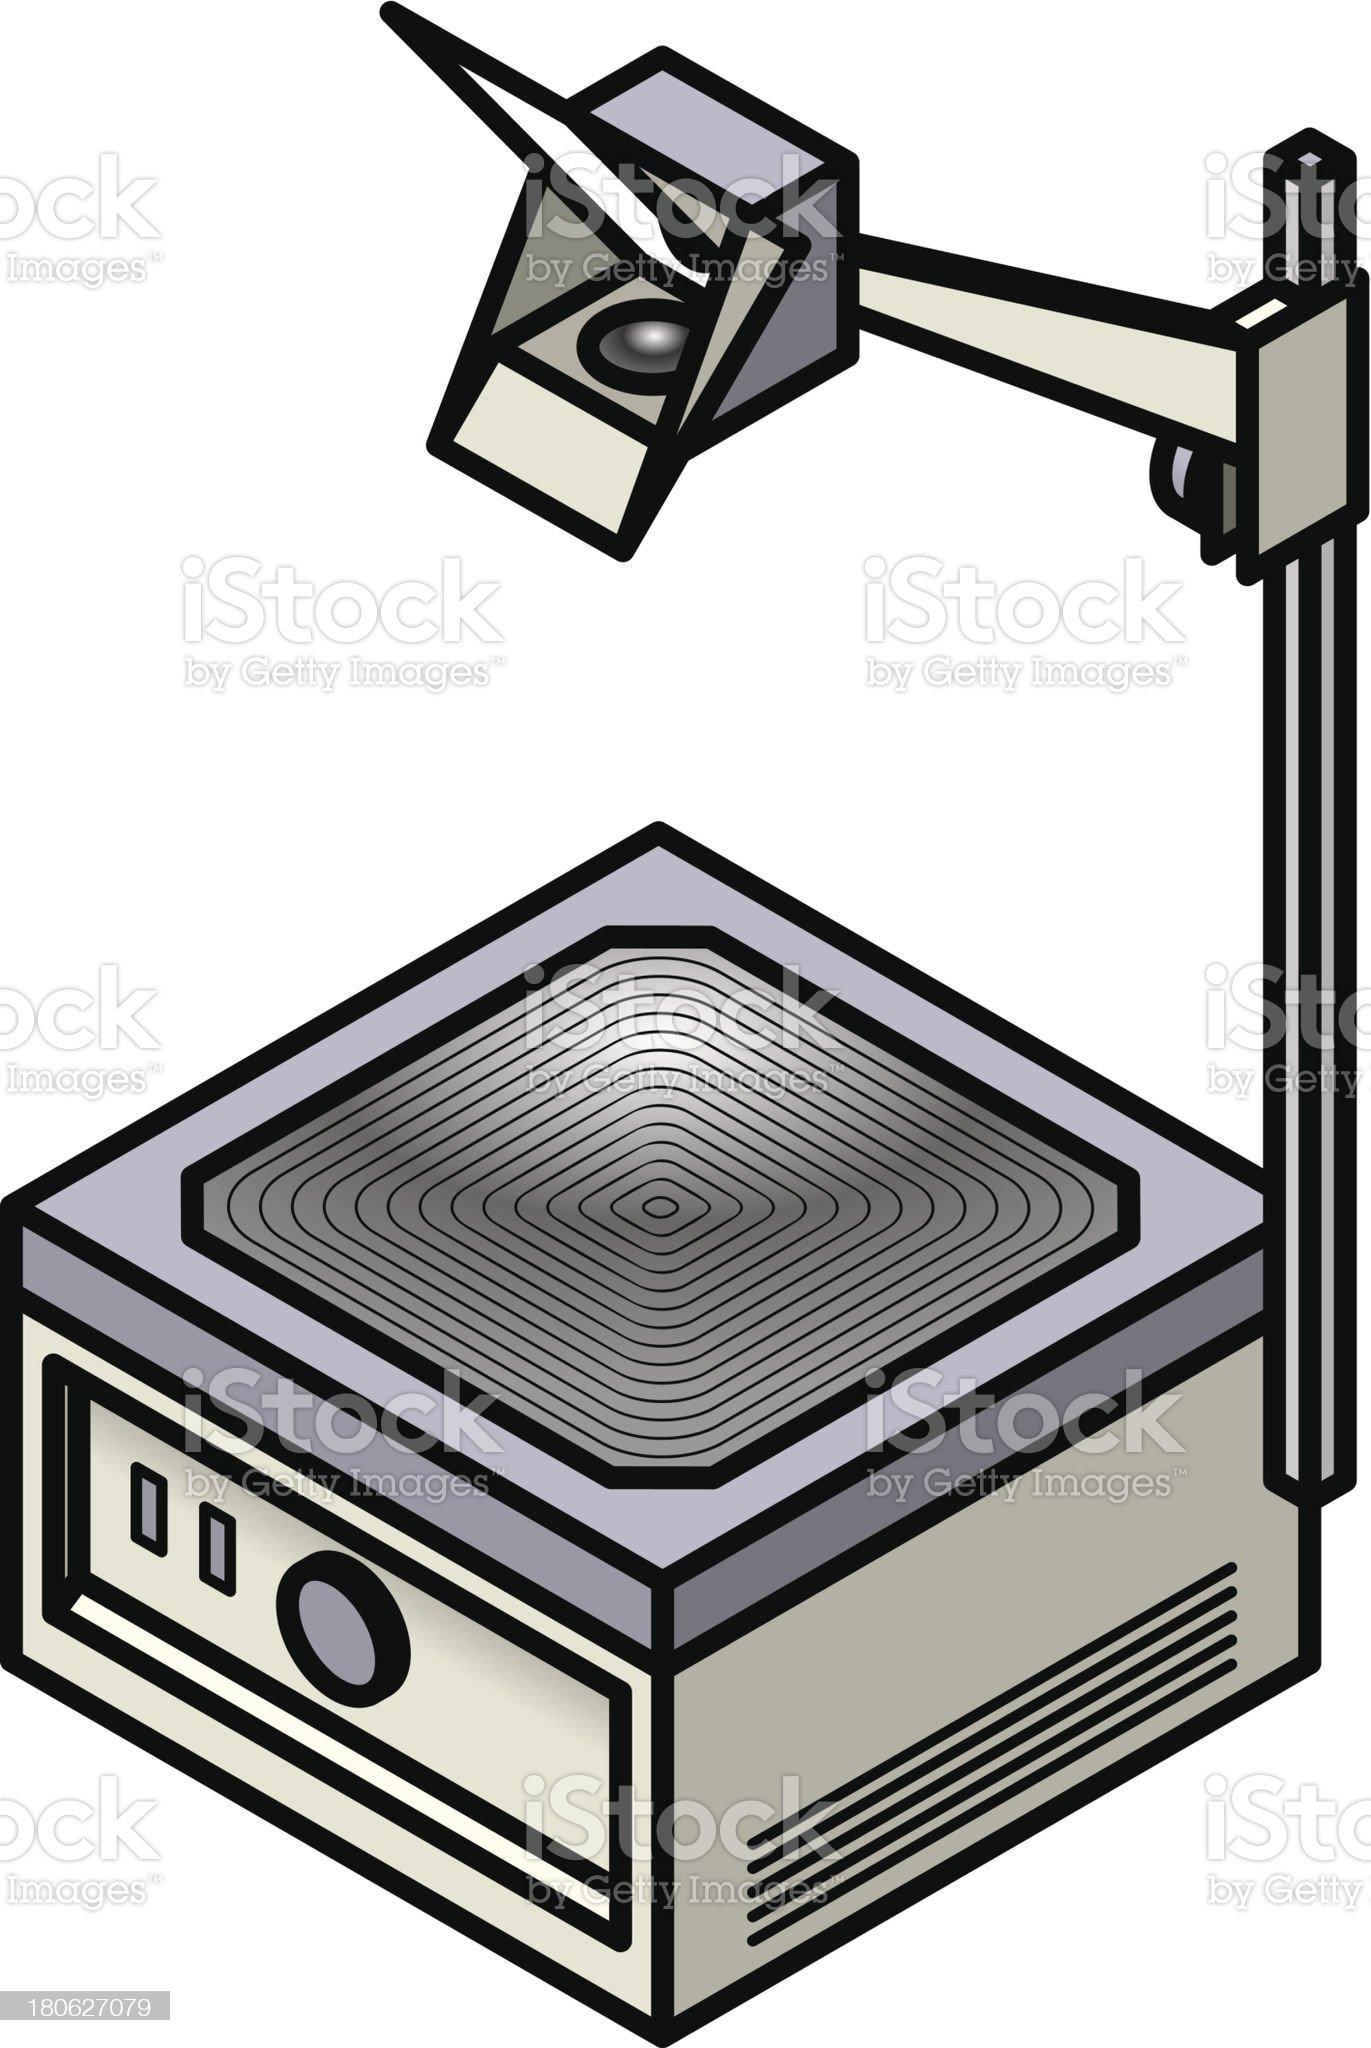 Old school projector royalty-free stock vector art